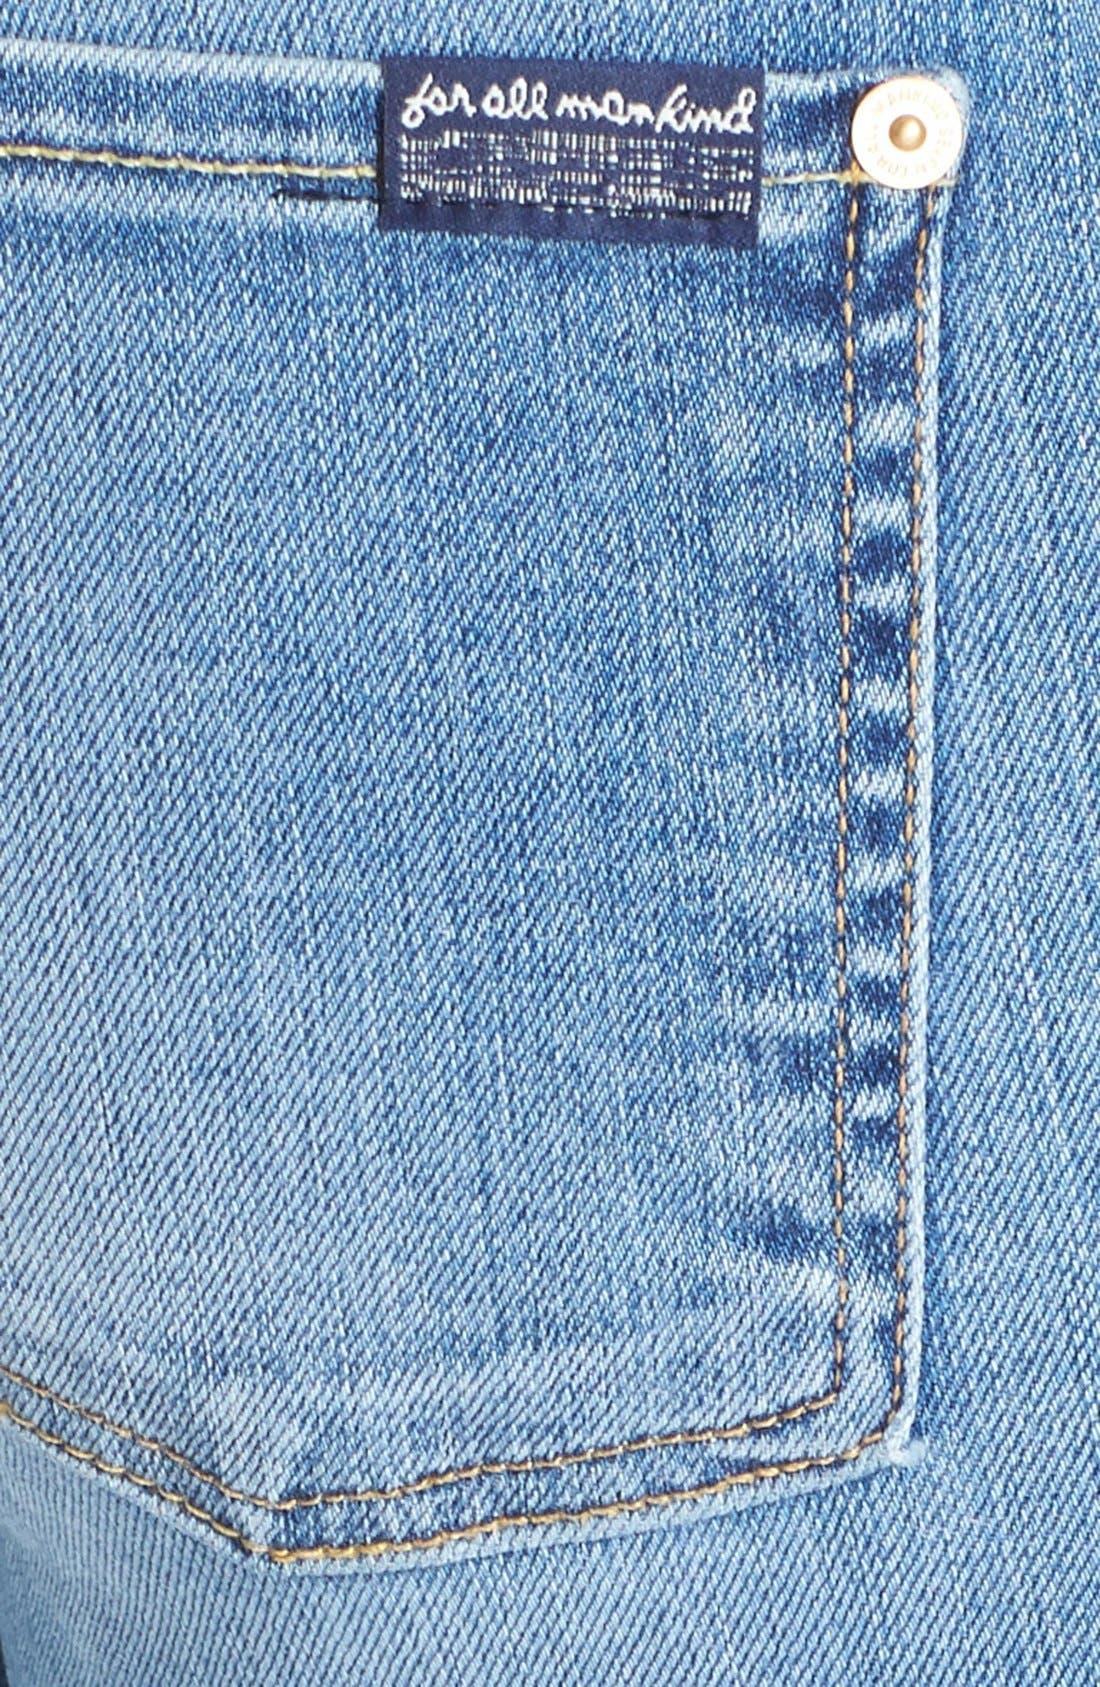 Alternate Image 3  - 7 For All Mankind® 'Modern' Straight Leg Stretch Jeans (Super Sanded Blue)